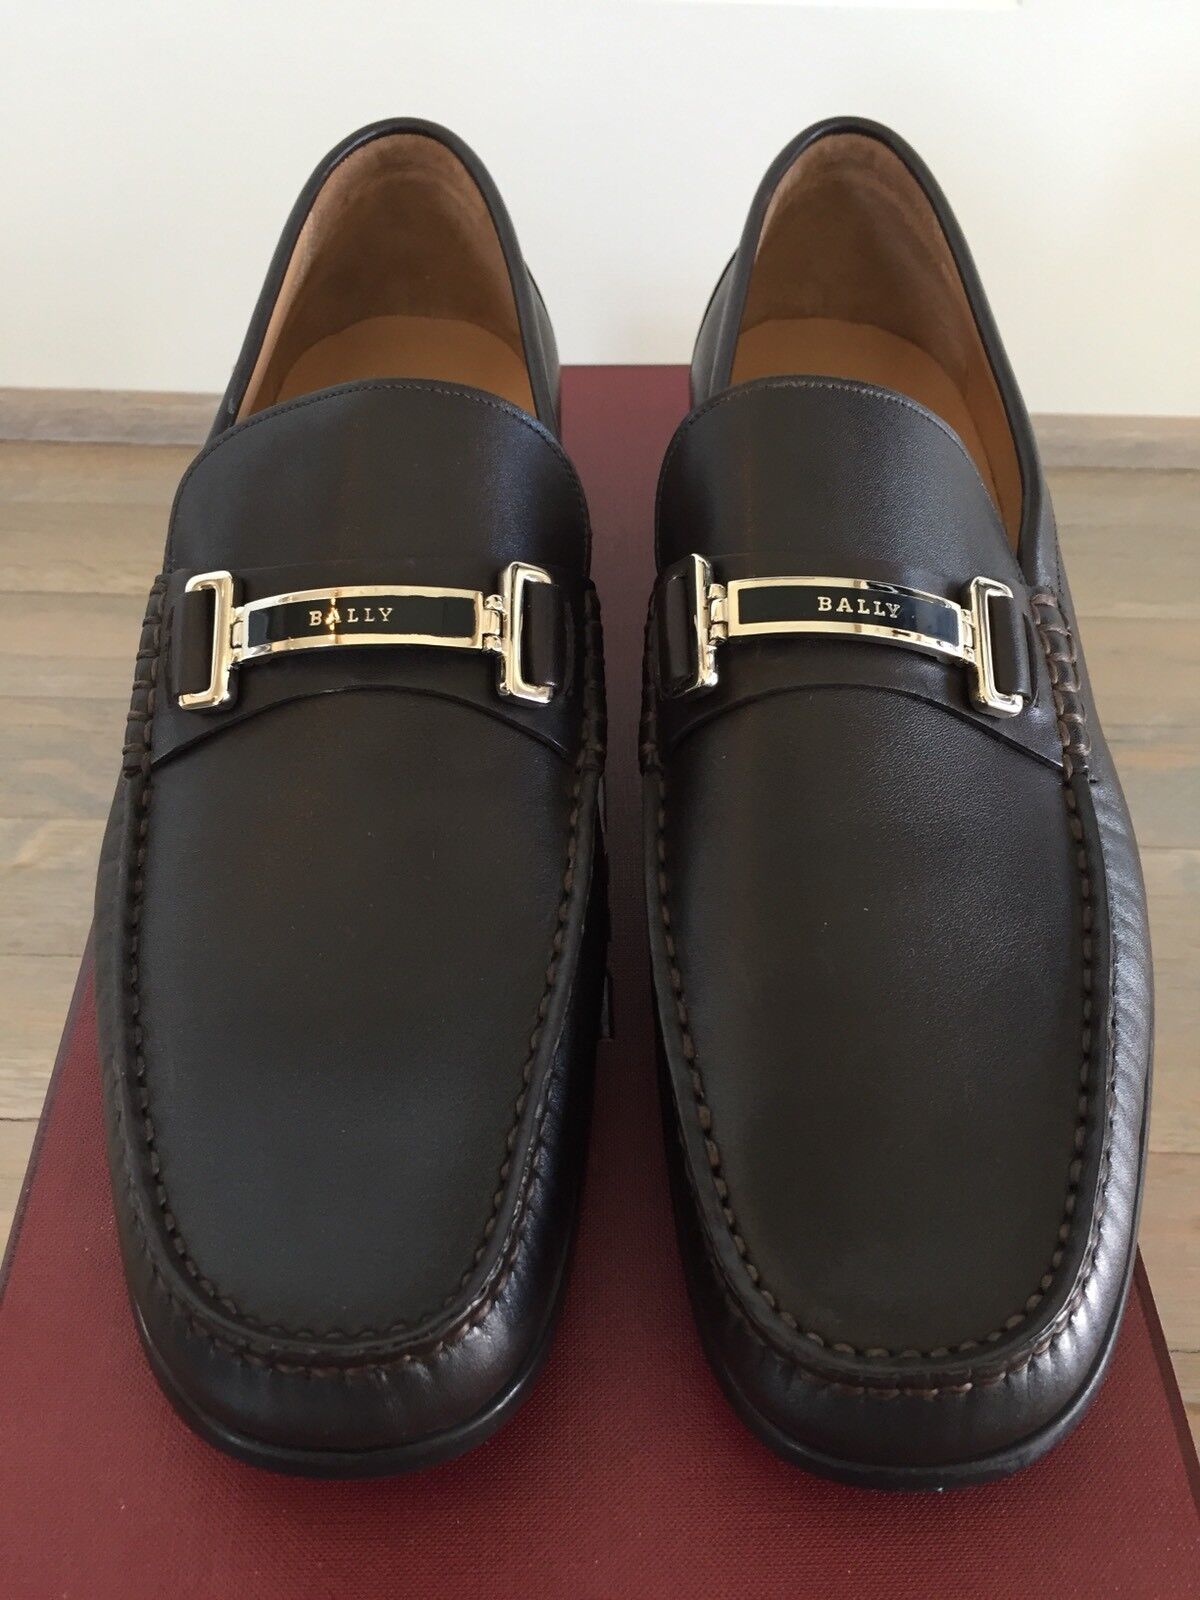 650$ Bally Brown Terenz Leather Loafers Size uomo US 10.5 Made in Switzerland Scarpe classiche da uomo Size fbf131